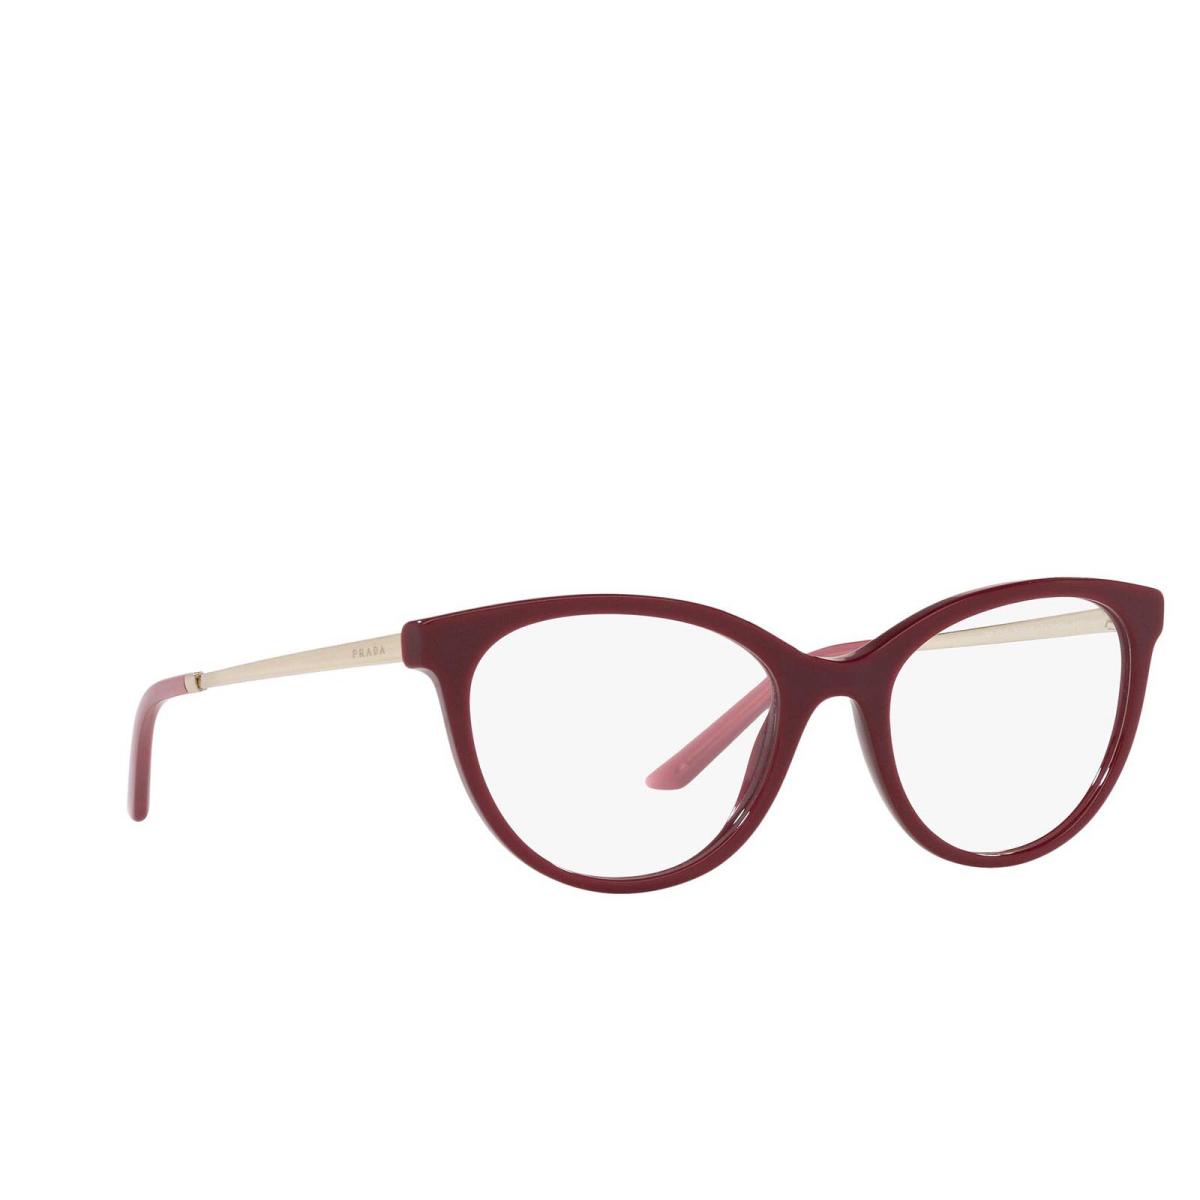 Prada® Cat-eye Eyeglasses: PR 17WV color Bordeaux TY71O1.